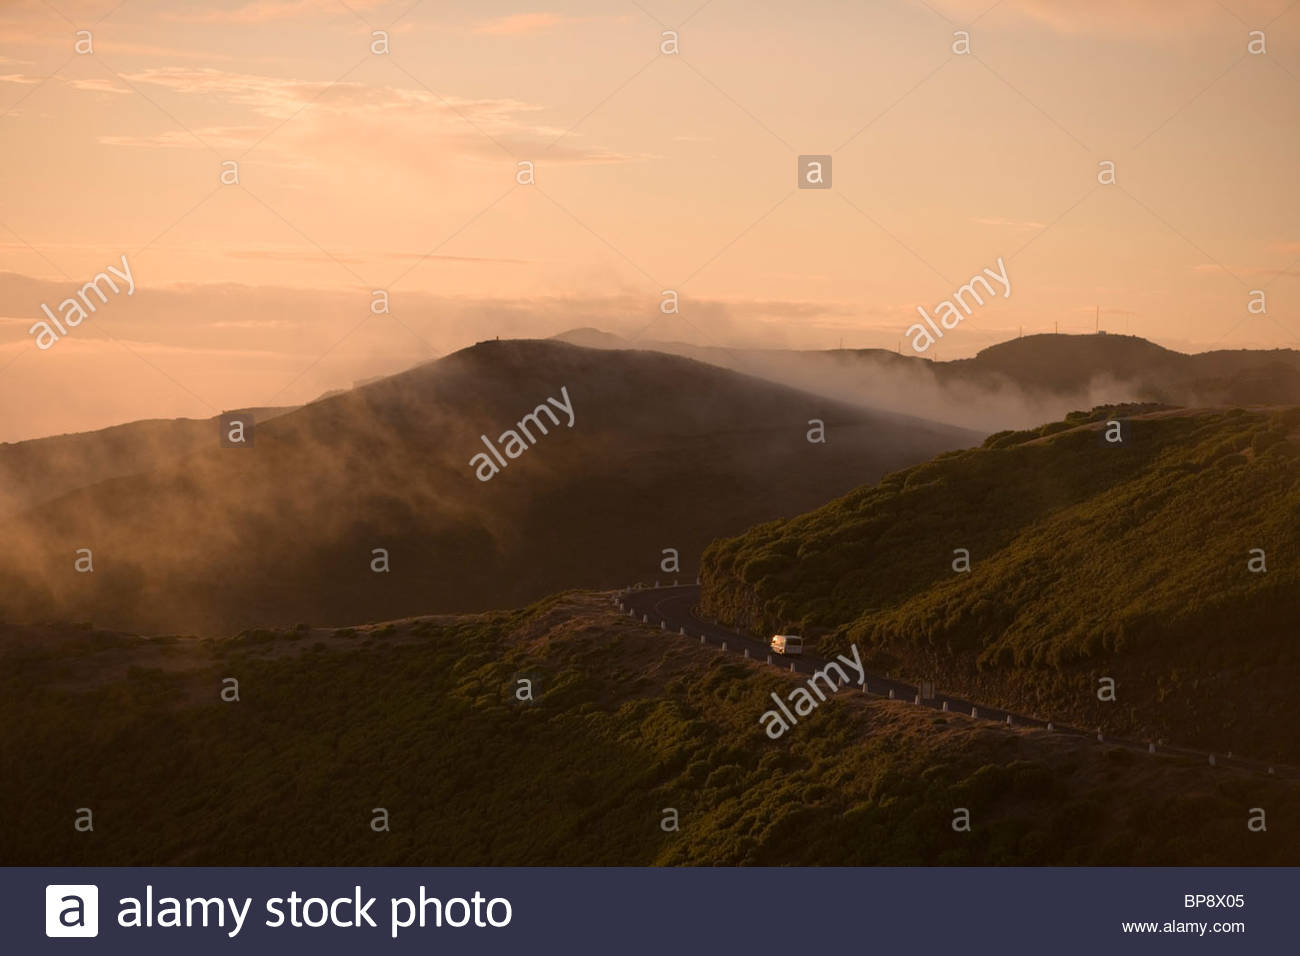 Mountain Road Sonnenuntergang, in der Nähe von Rabacal, Paul da Serra Plateau, Madeira, Portugal Stockbild